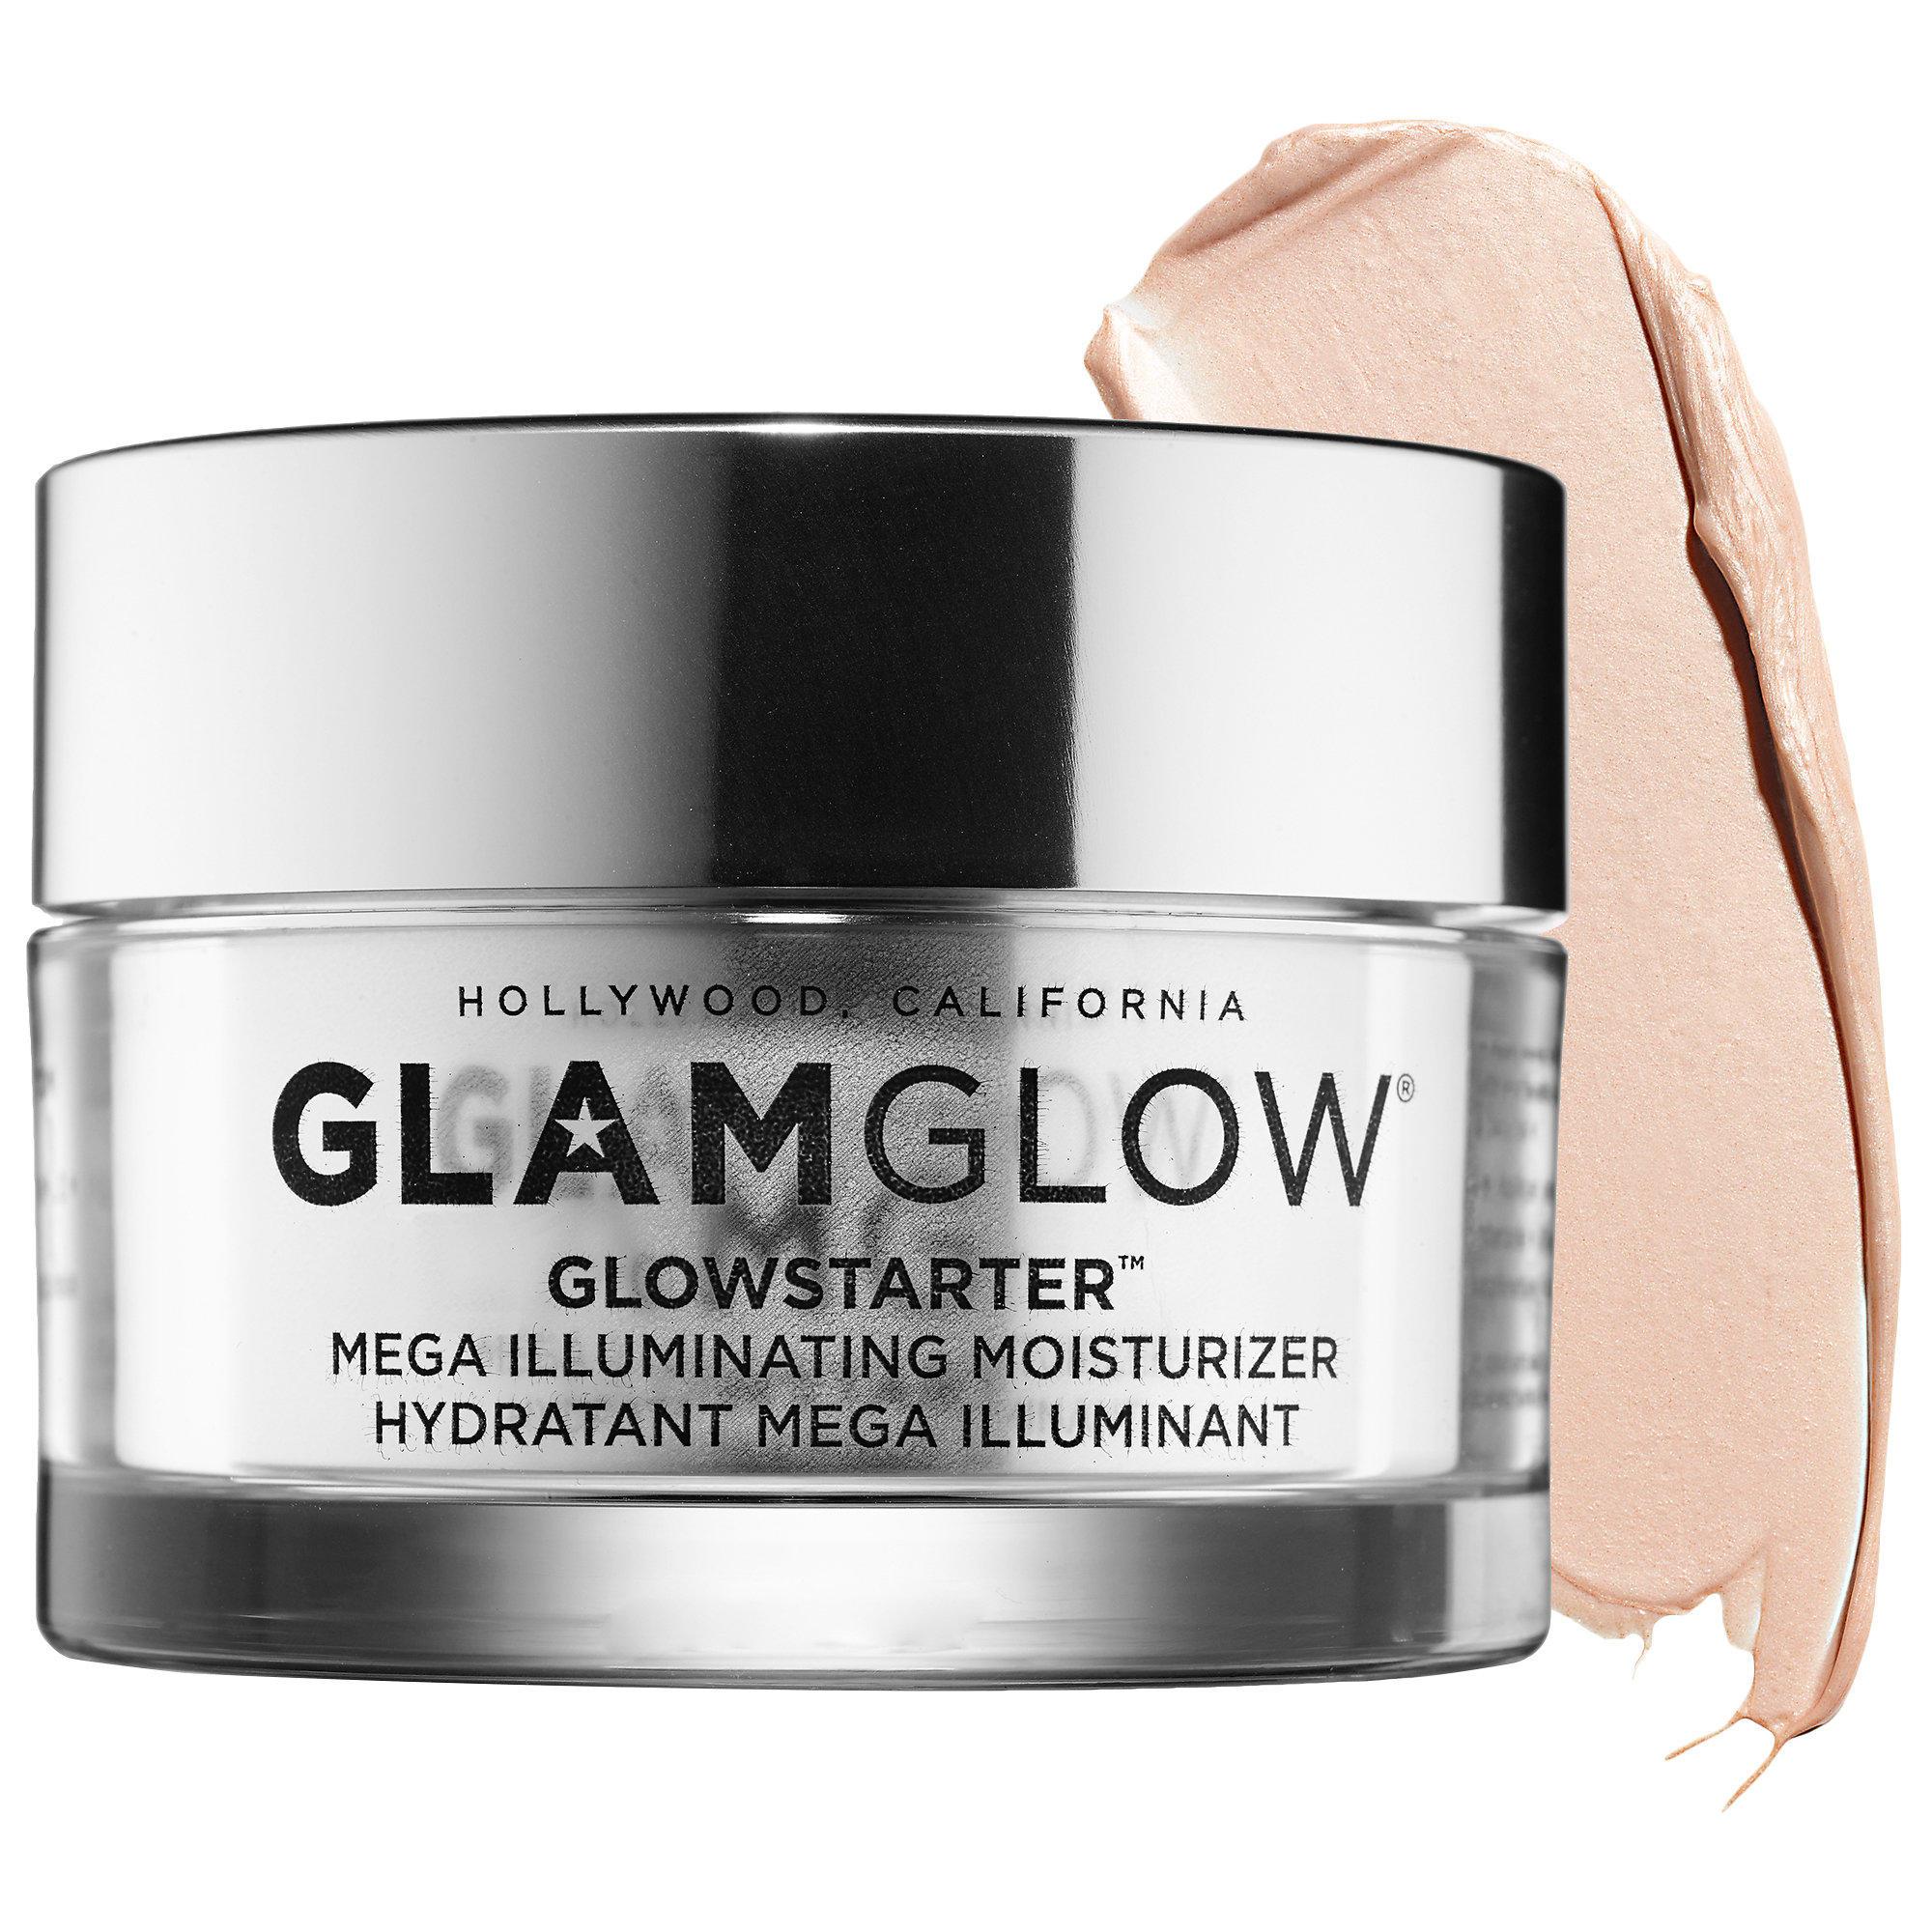 Glamglow Glowstarter Mega Illuminating Moisturizer Nude Glow